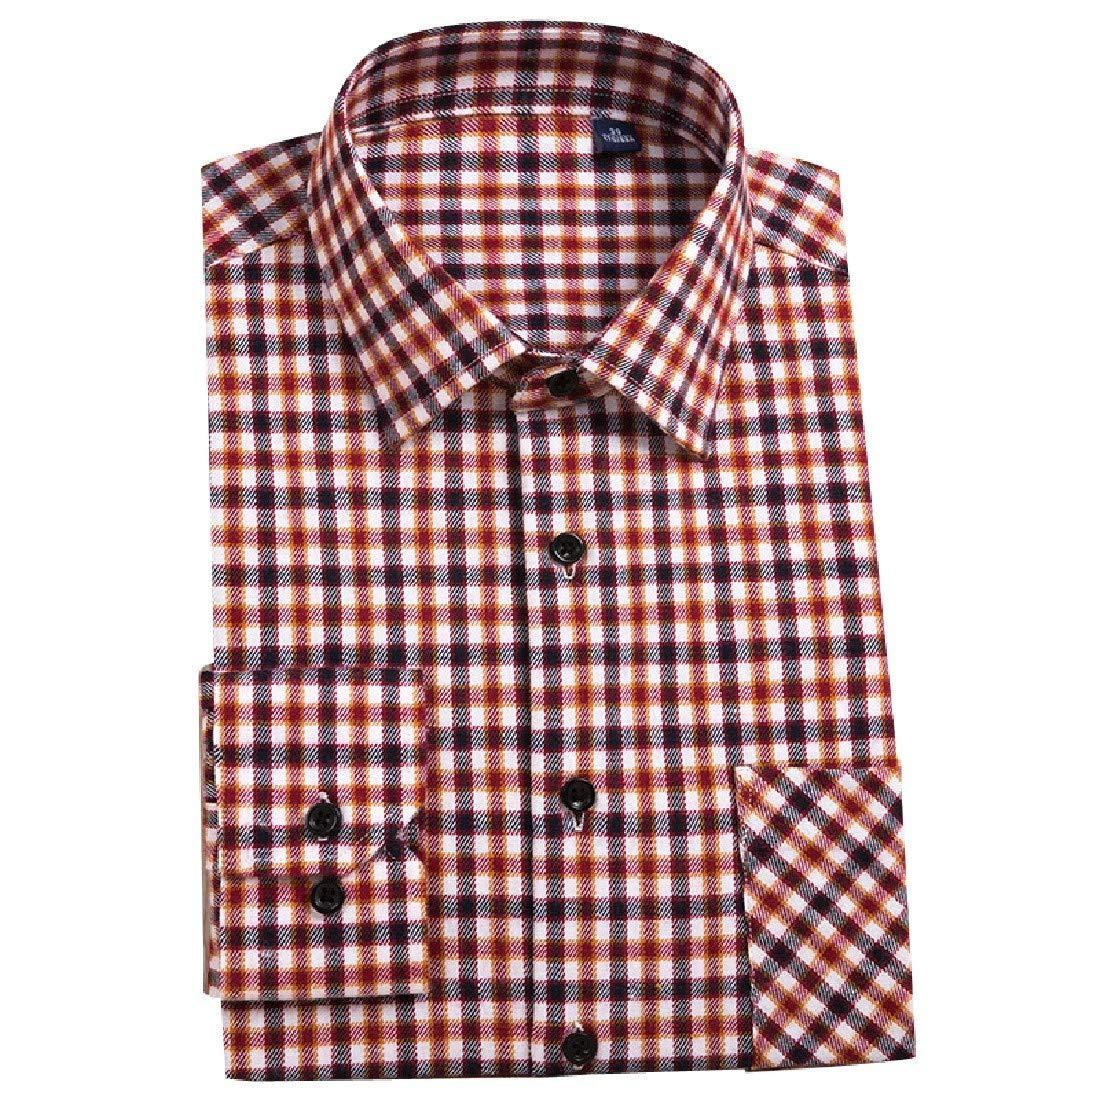 YUNY Mens Flannel Plaid Lounge Long-Sleeve Button Down Shirt 4 5XL